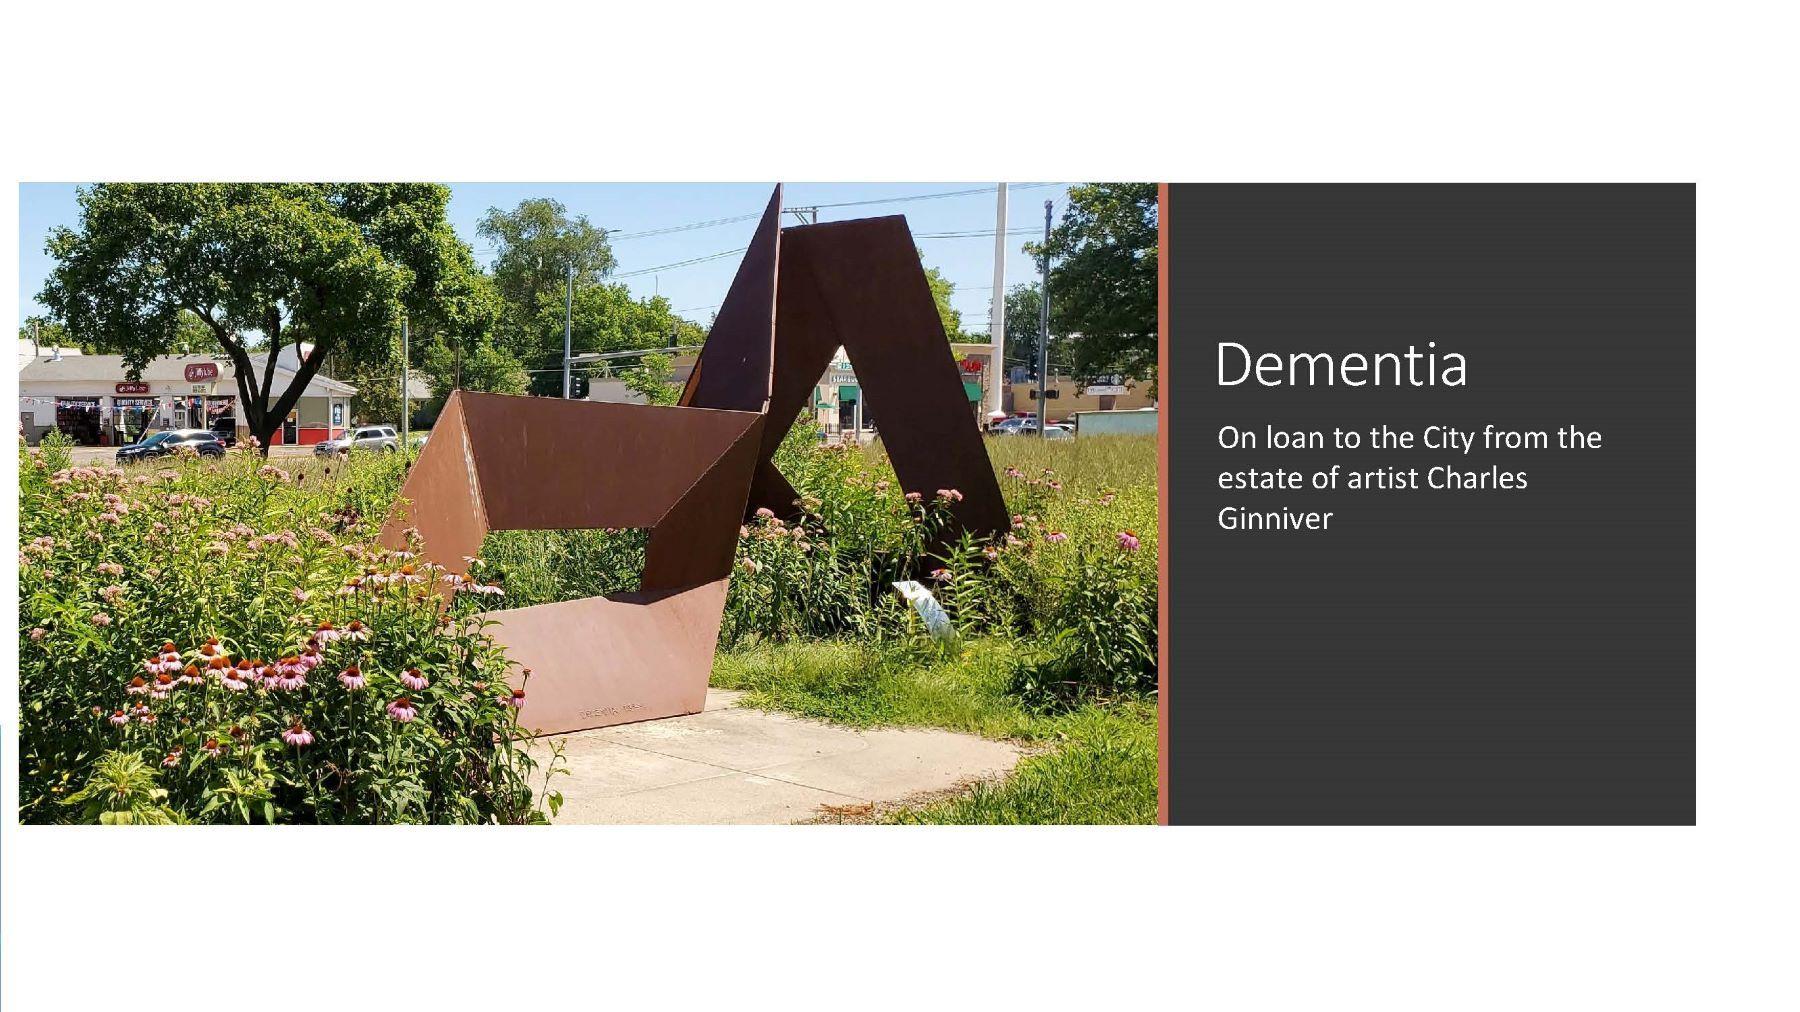 Dementia / Charles Ginniver